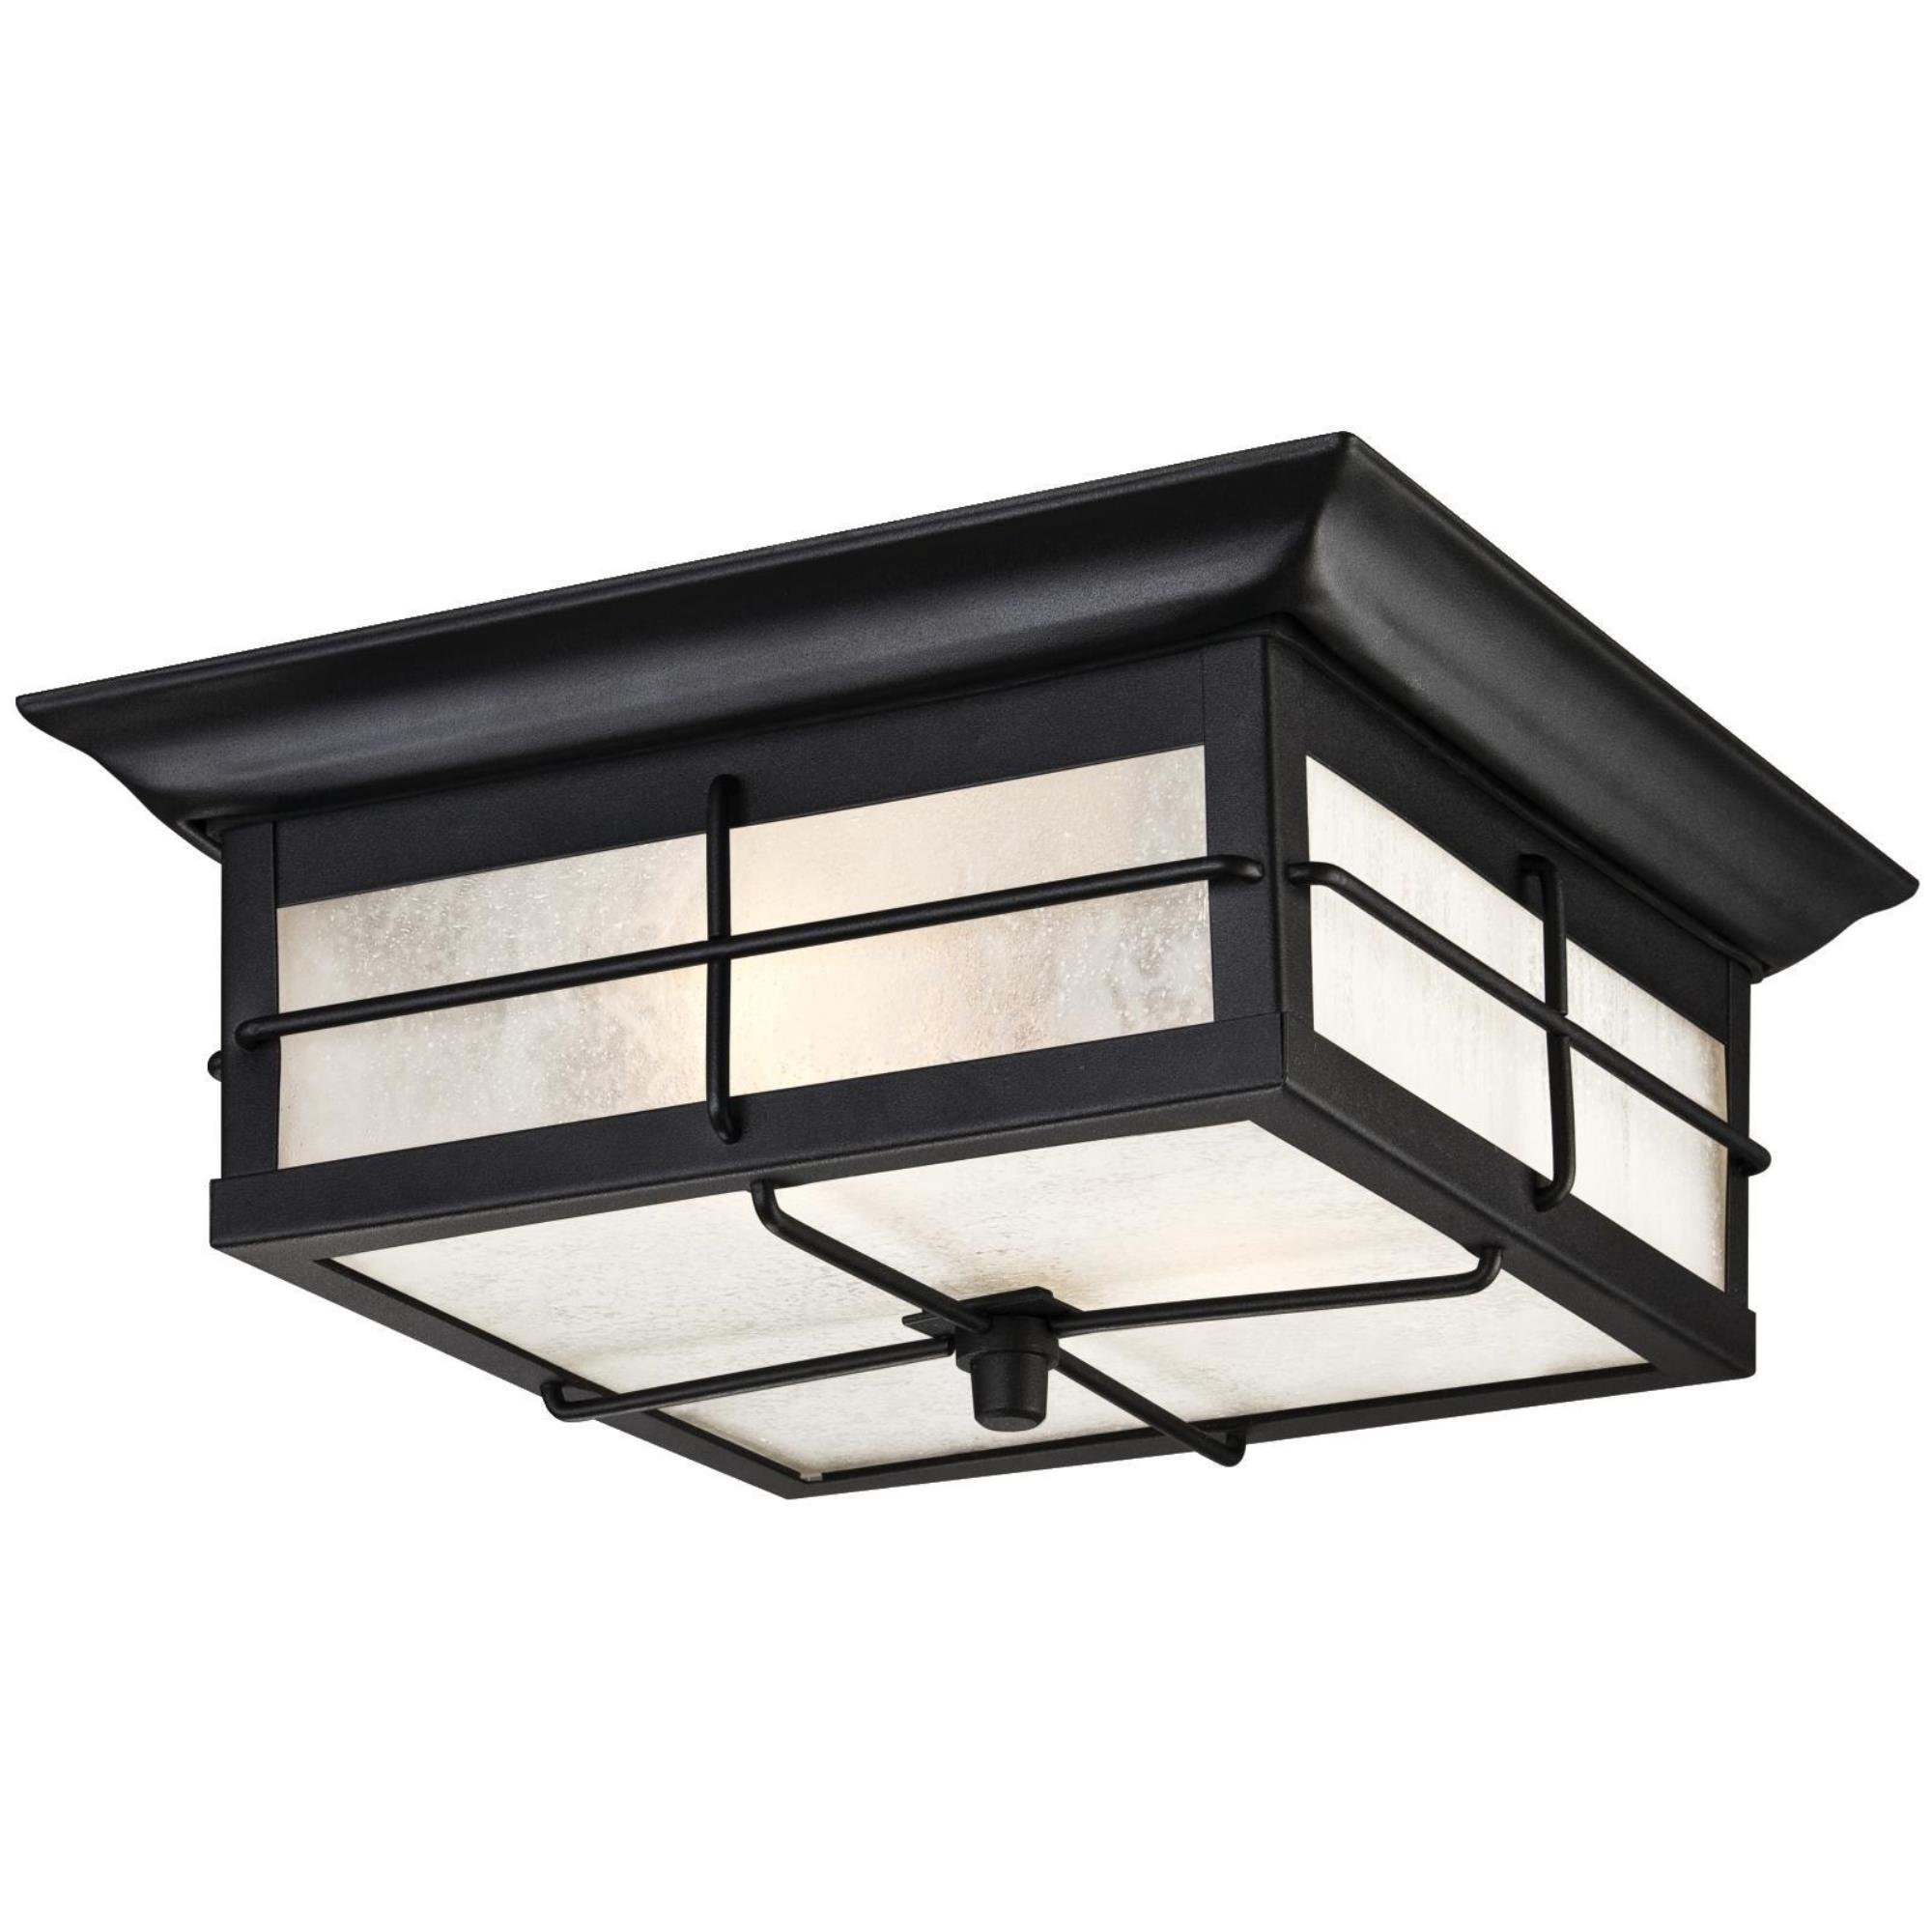 outdoor ceiling lights amazon com rh amazon com outdoor porch lights ceiling mount outdoor porch ceiling lights with motion sensor